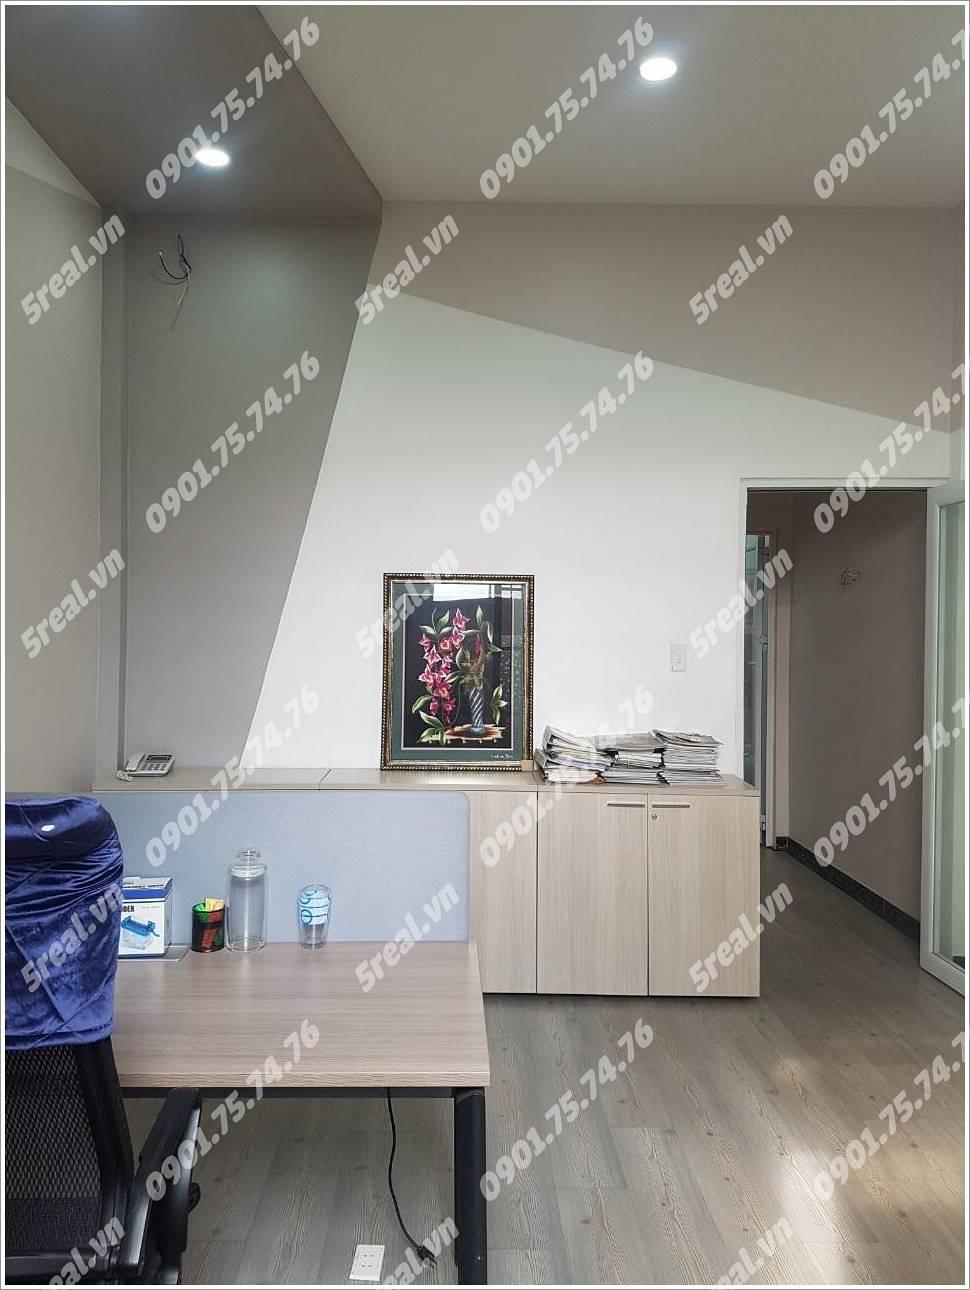 doo-building-nguyen-van-qua-quan-12-van-phong-cho-thue-5real.vn-05